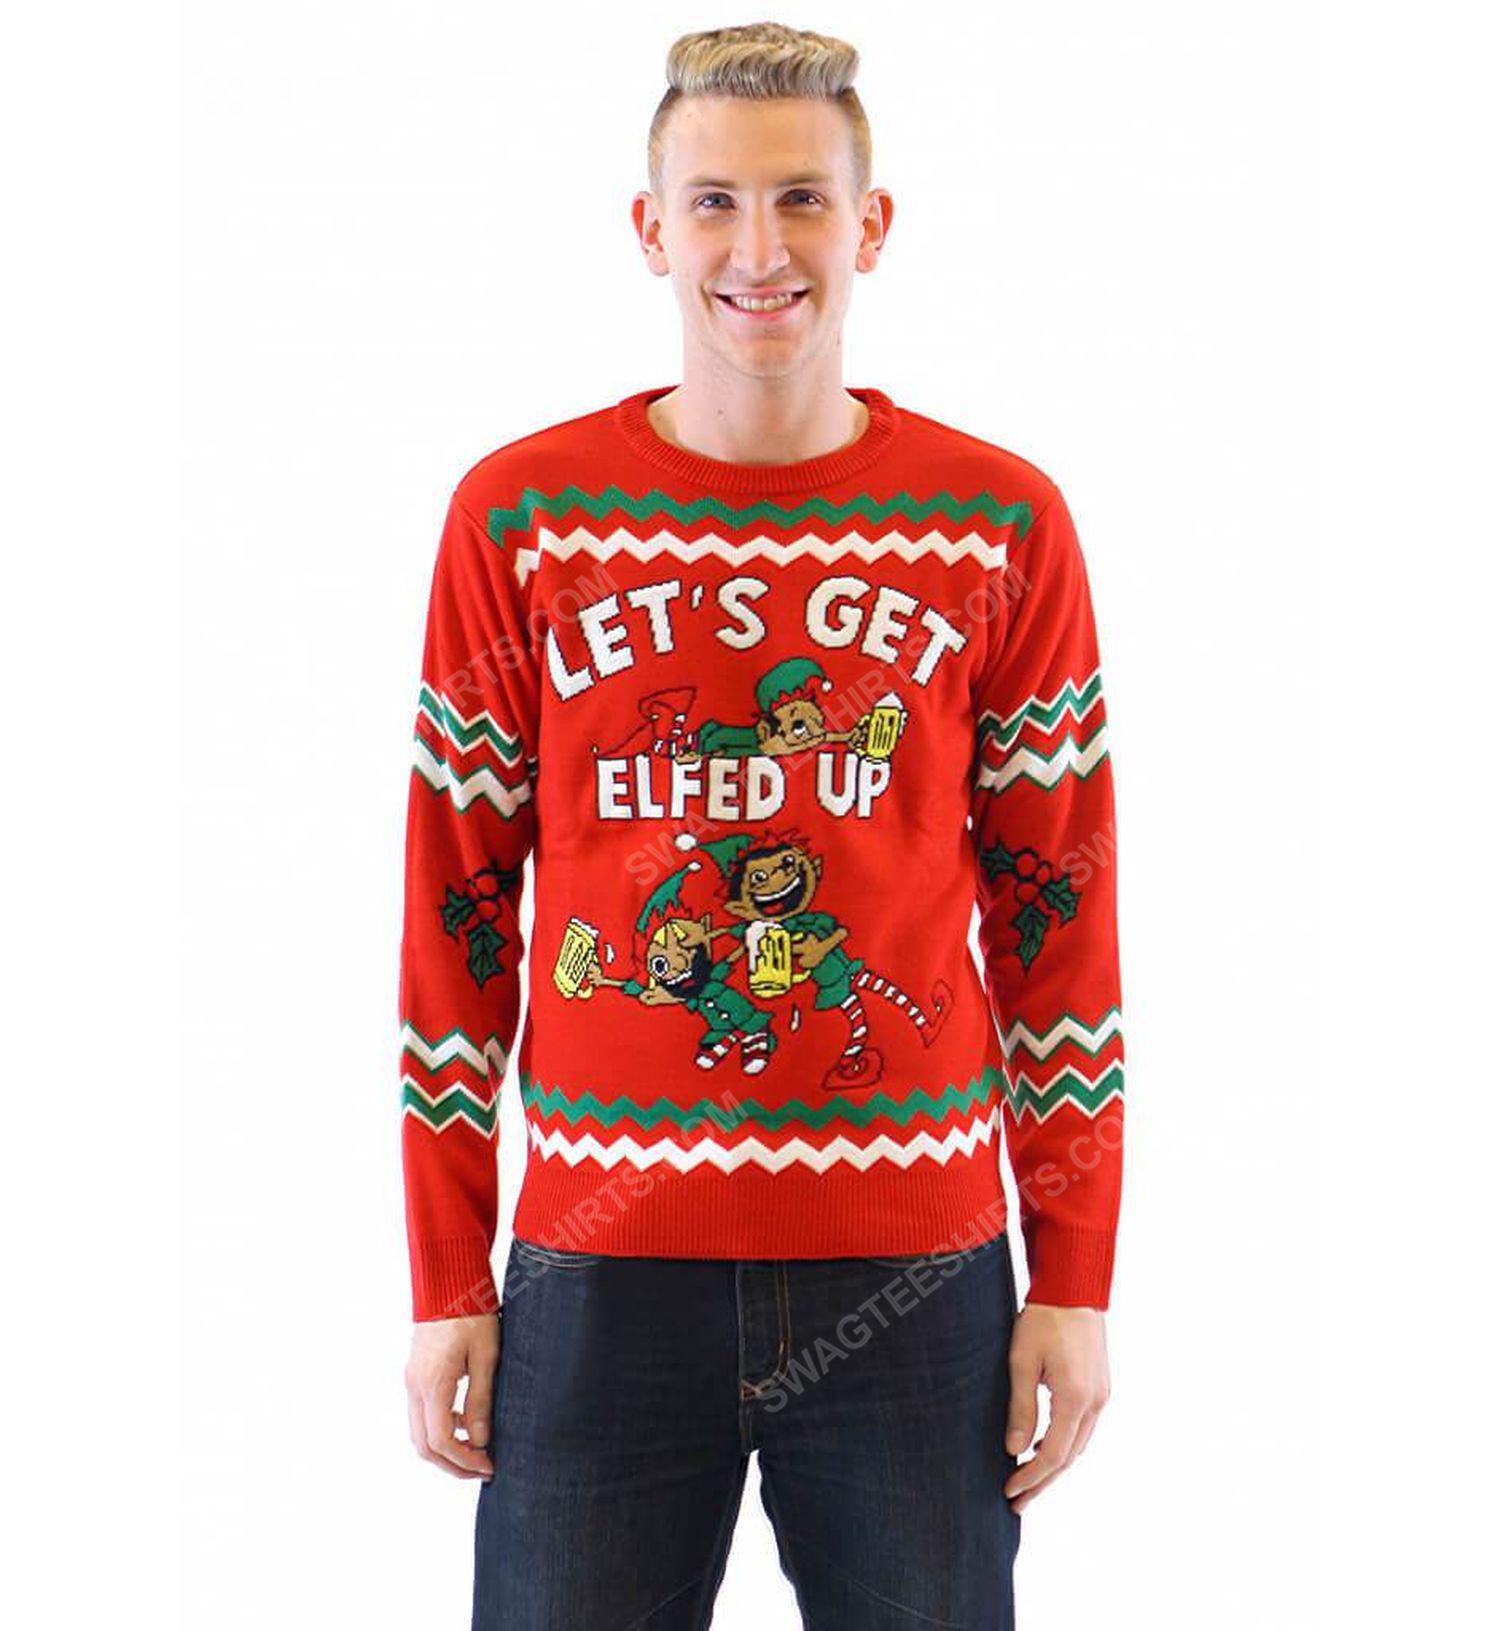 Let's get elfed up drunken elves full print ugly christmas sweater 2 - Copy